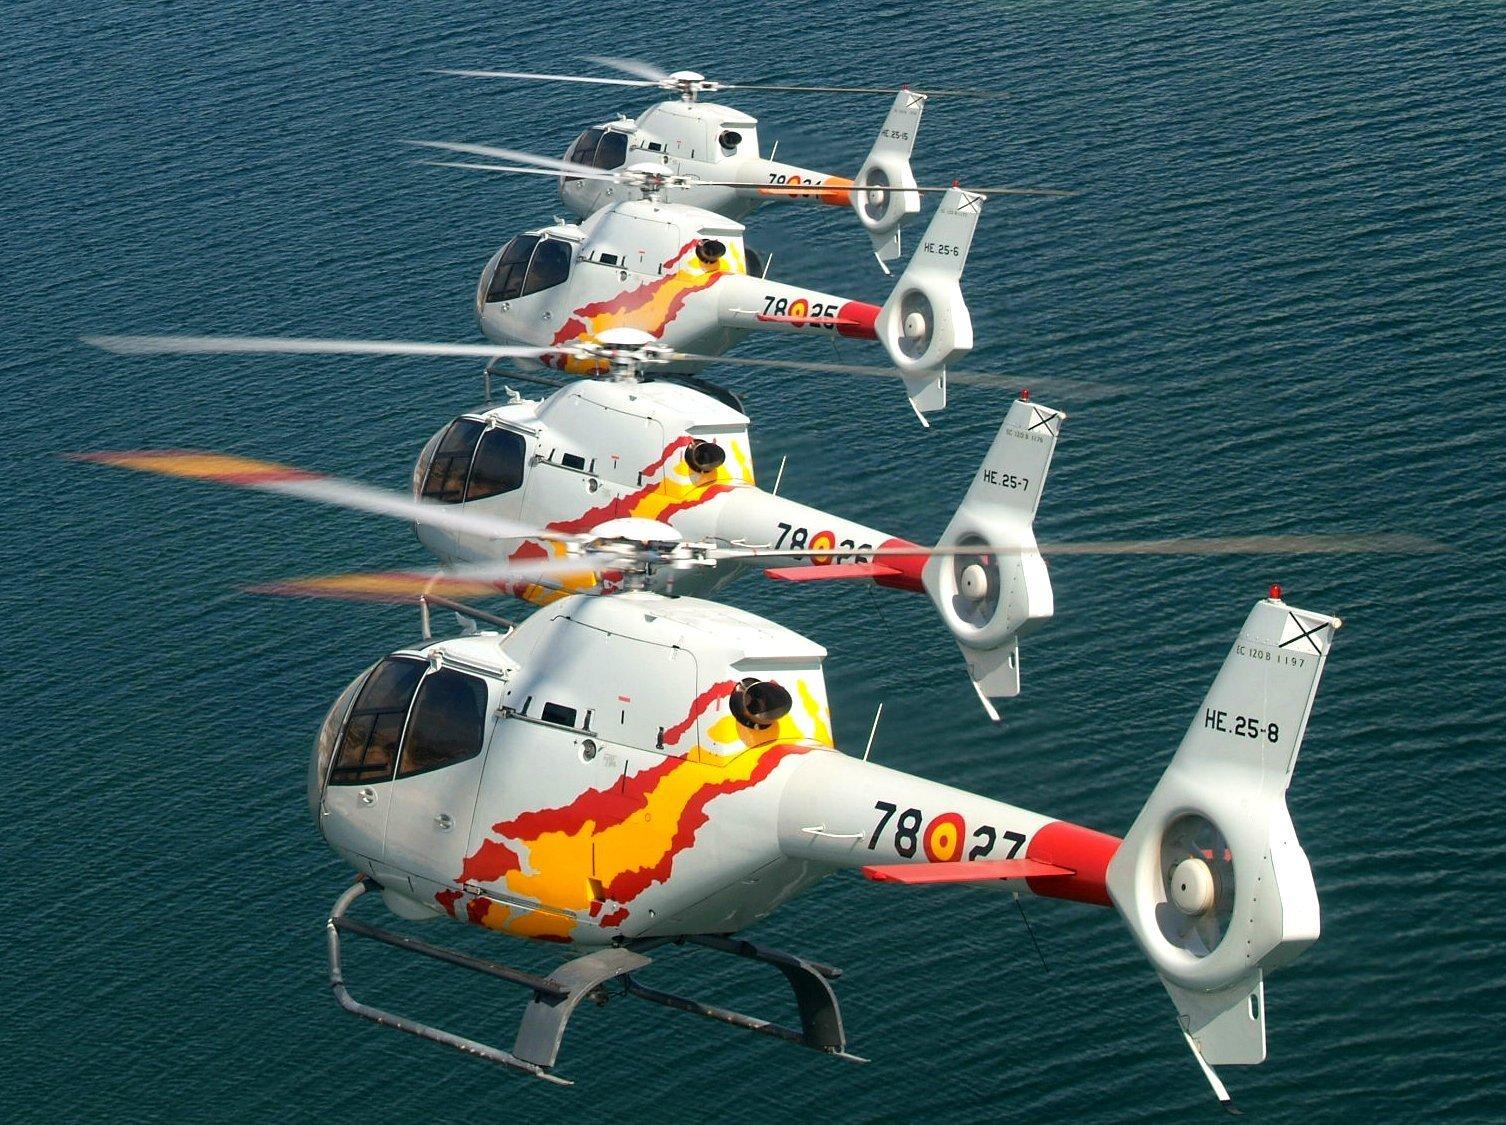 Helicópteros EC-120 Colibrí